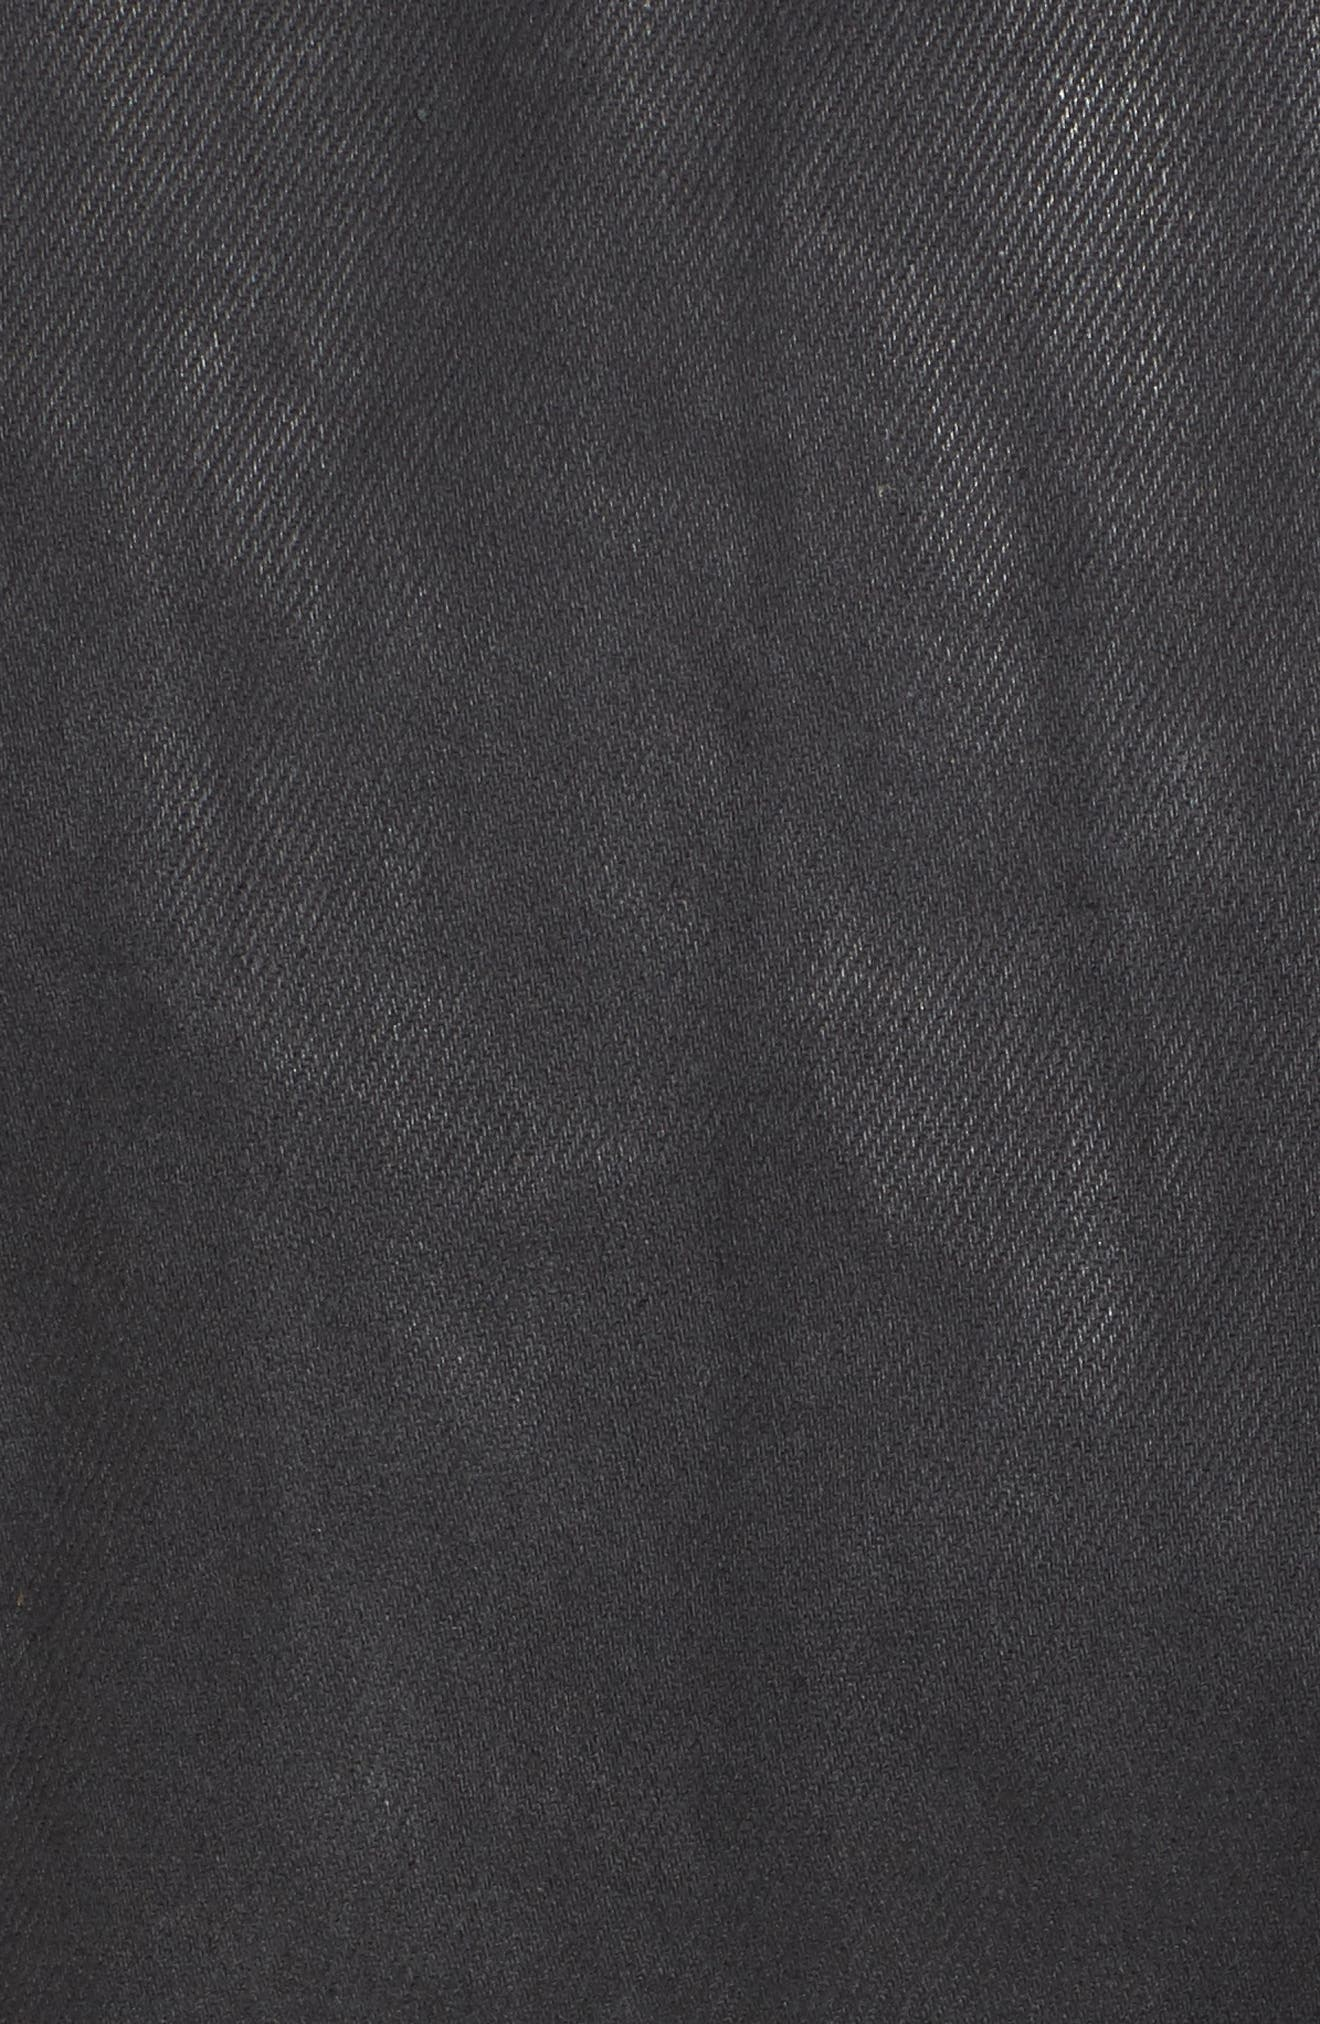 Alternate Image 5  - G-Star Raw Motac 3D Slim Denim Jacket